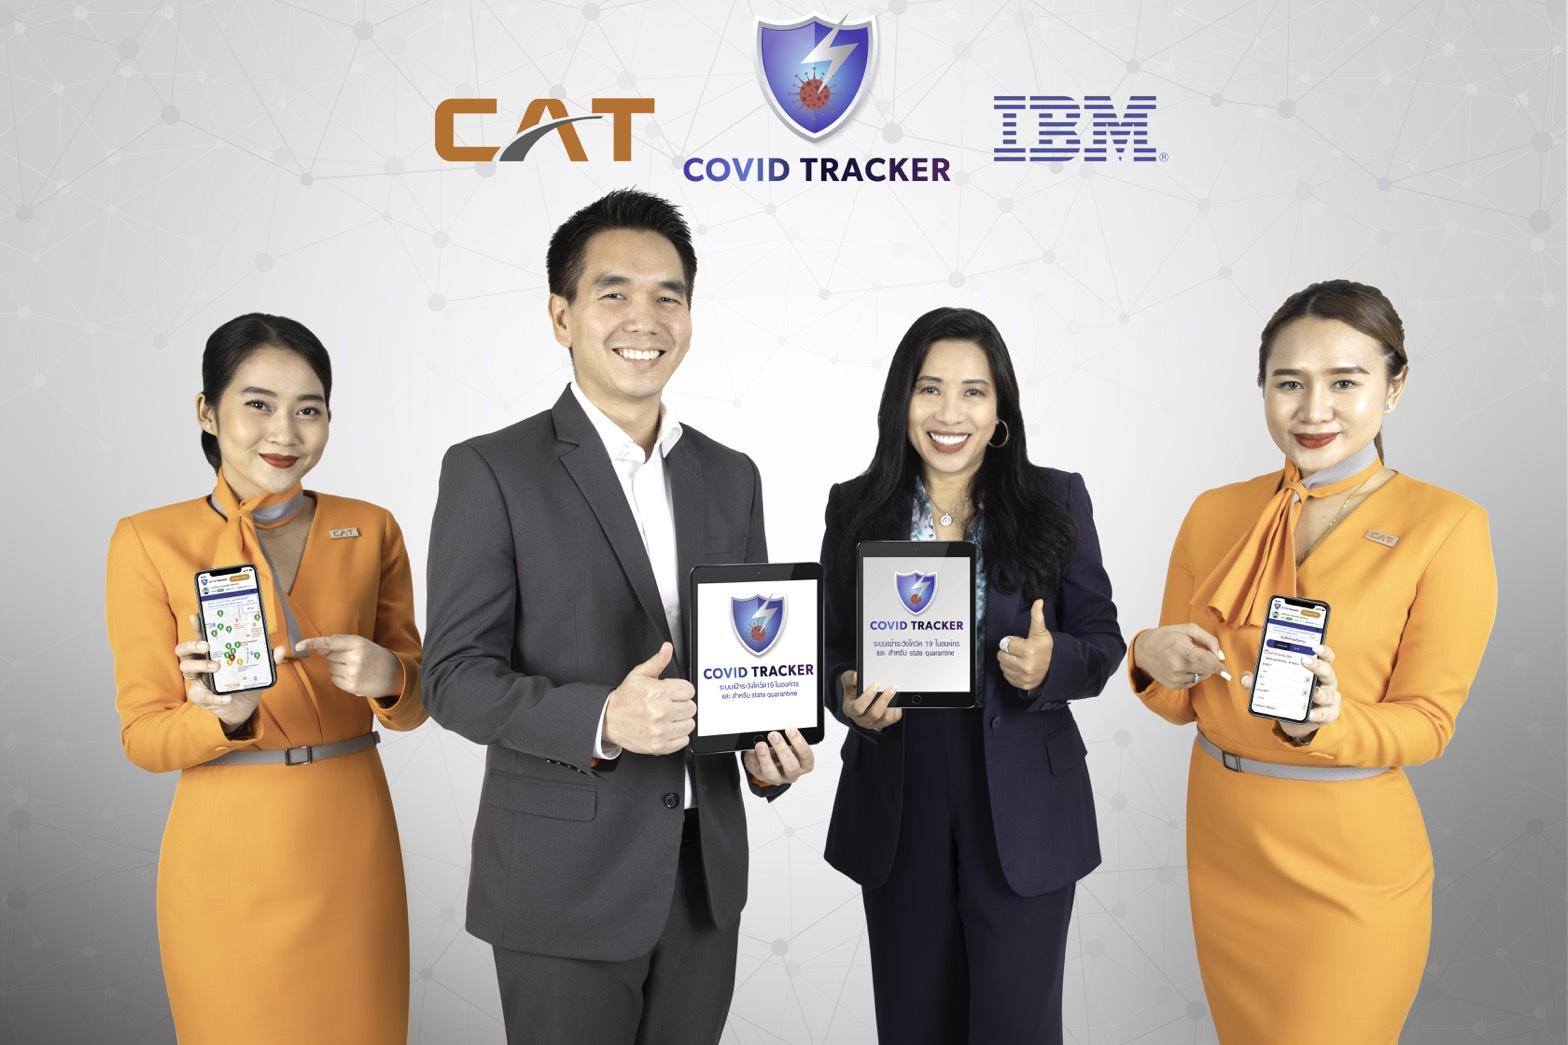 CAT หนุนผู้ประกอบการโรงแรม เปิดตัว CAT Covid Tracker ระบบเฝ้าระวังสุขภาพนักท่องเที่ยวต่างชาติ